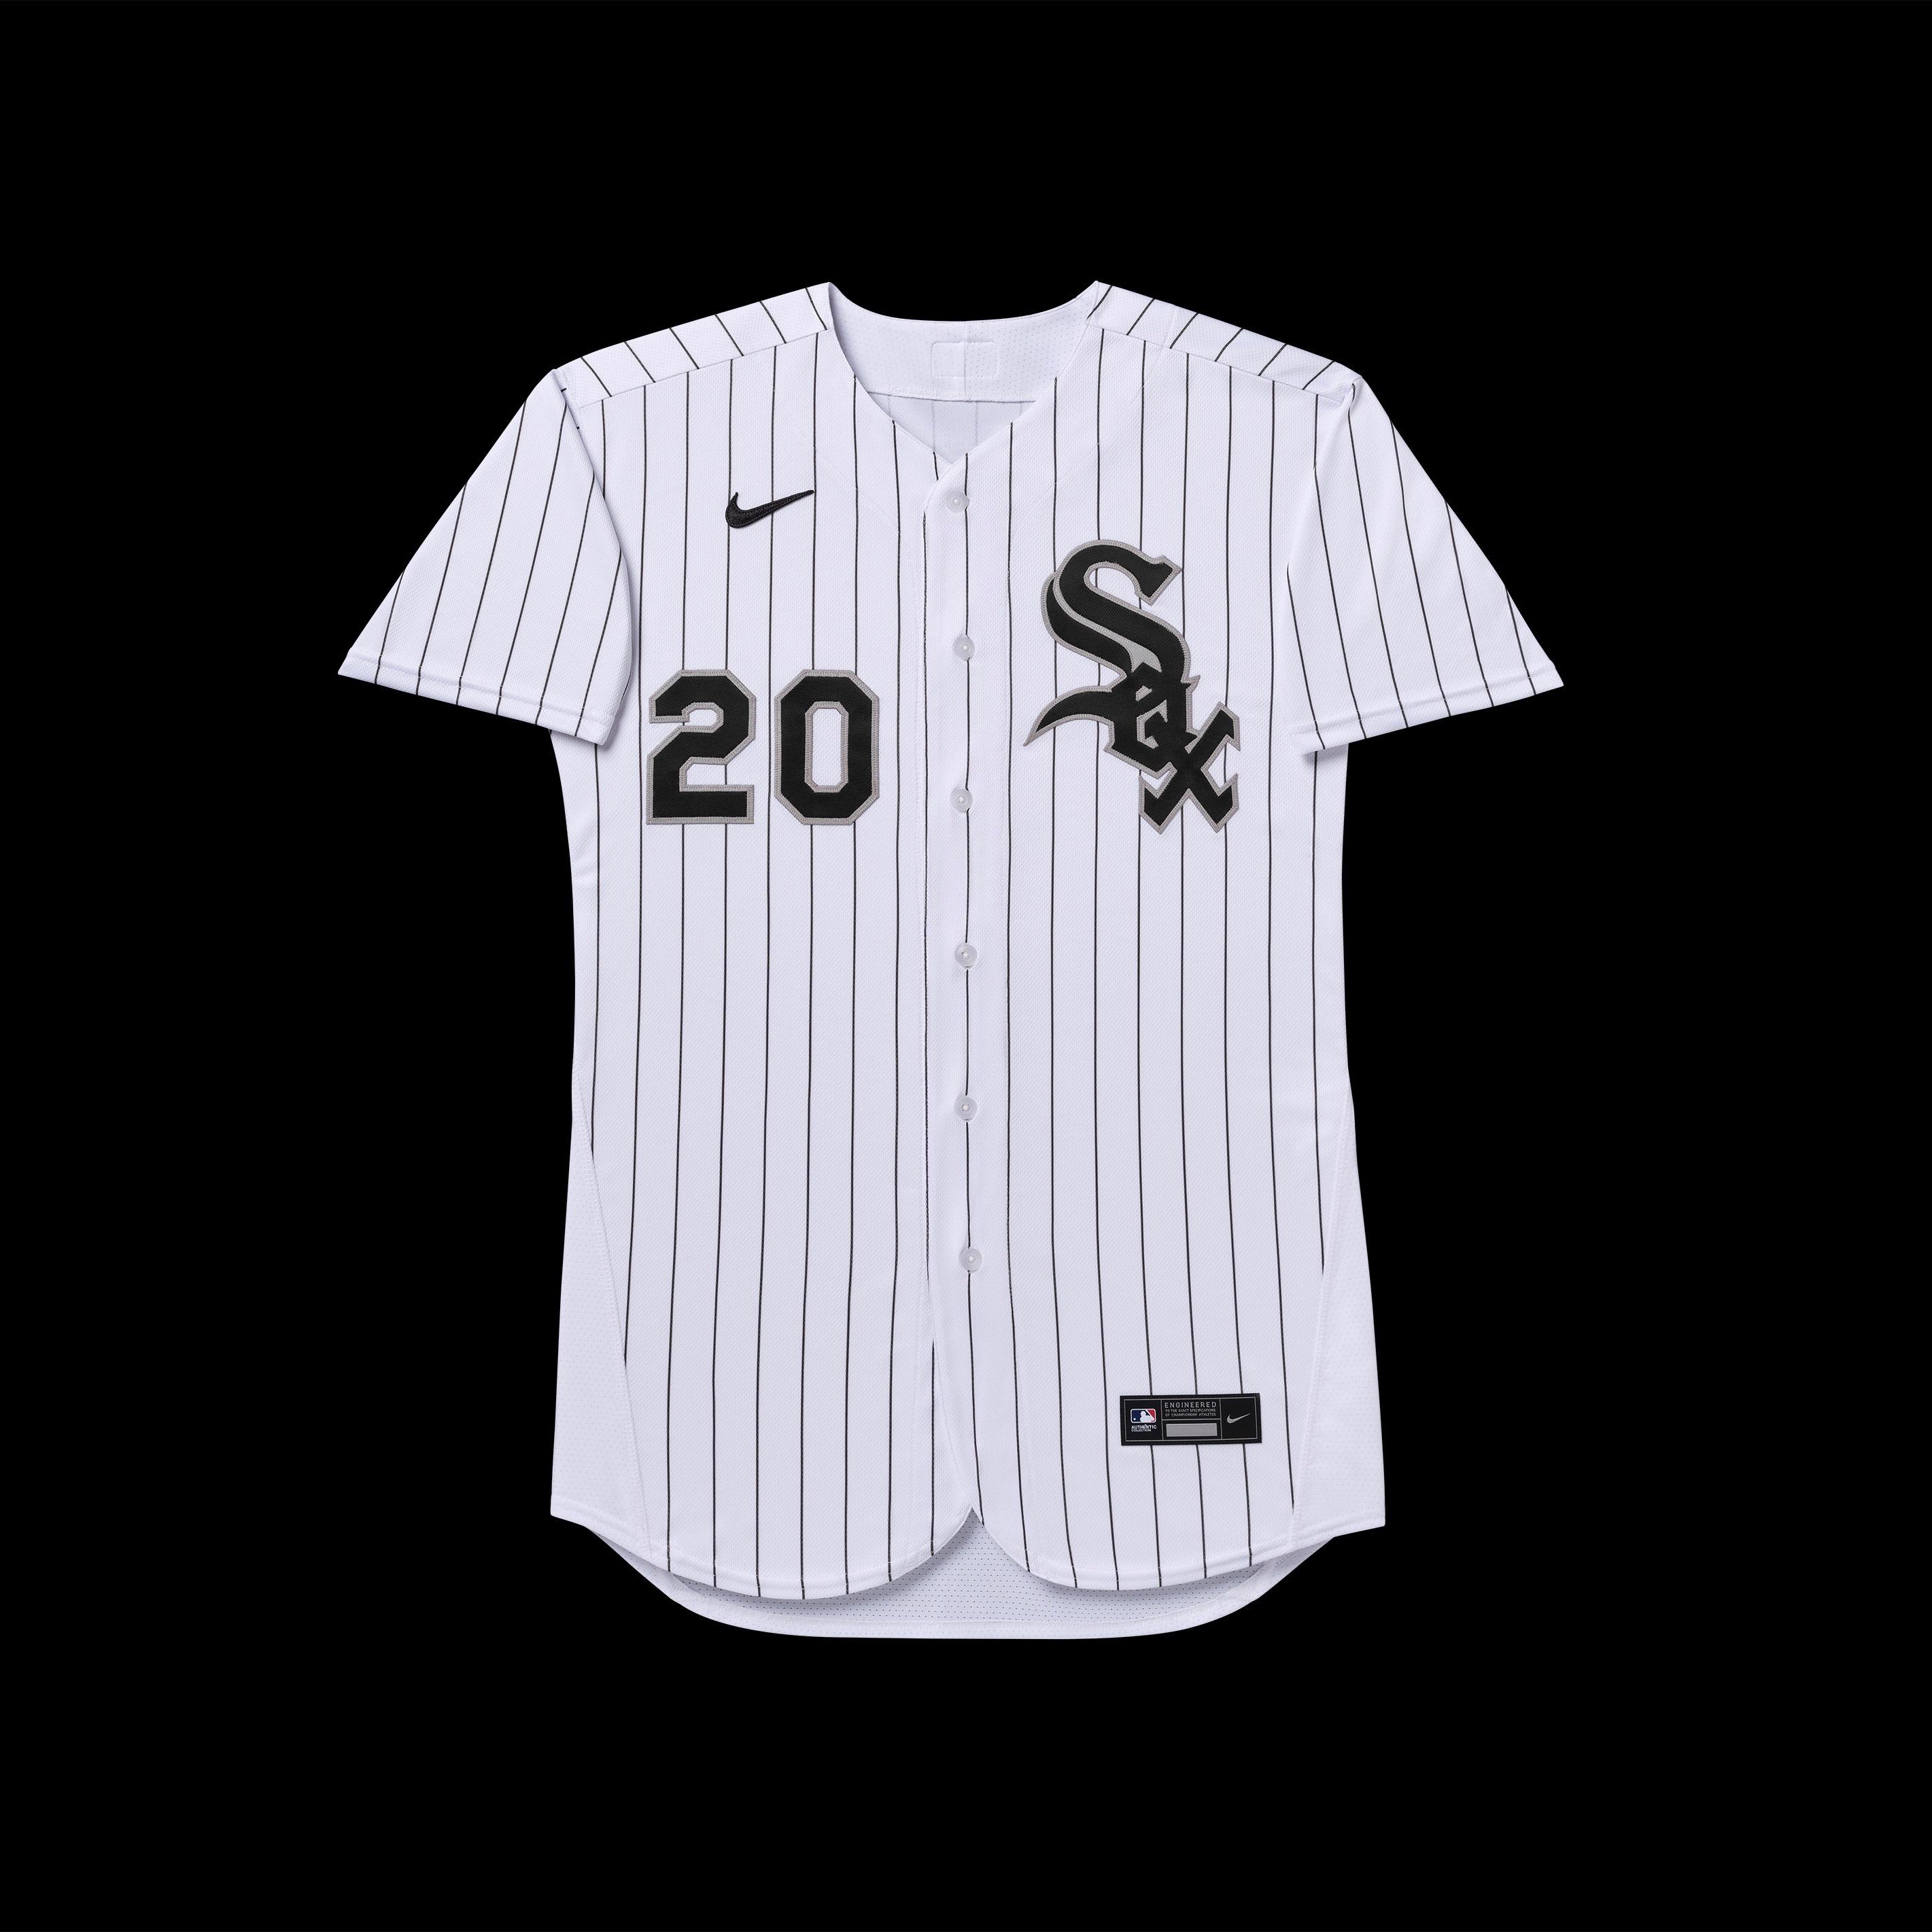 chicago white sox 2020 uniforms